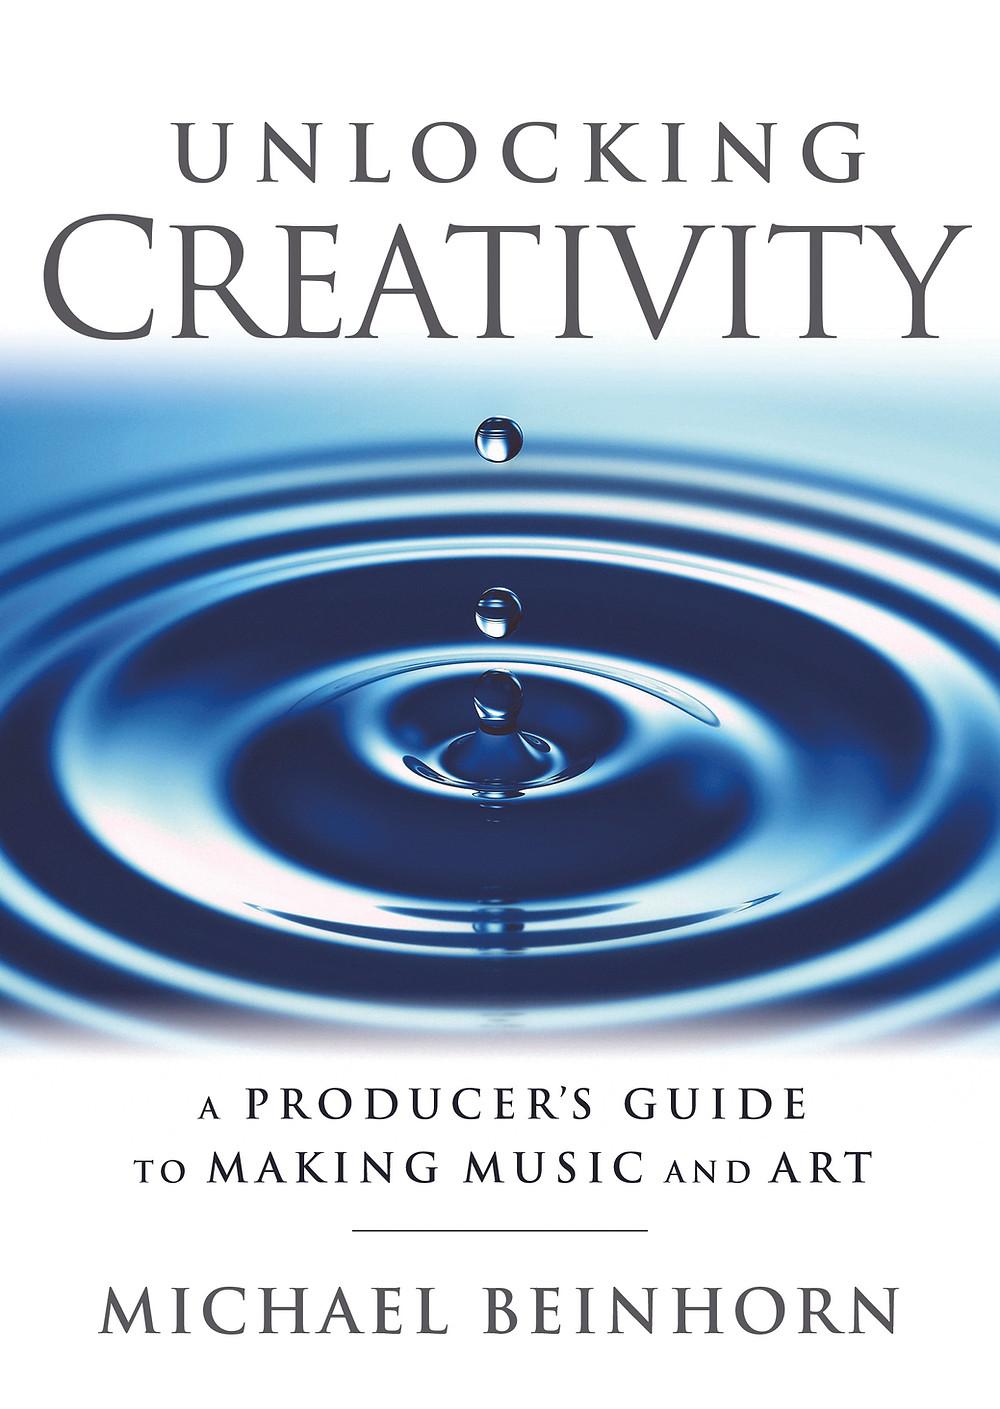 HL_Unlocking_Creativity_Cover.jpeg